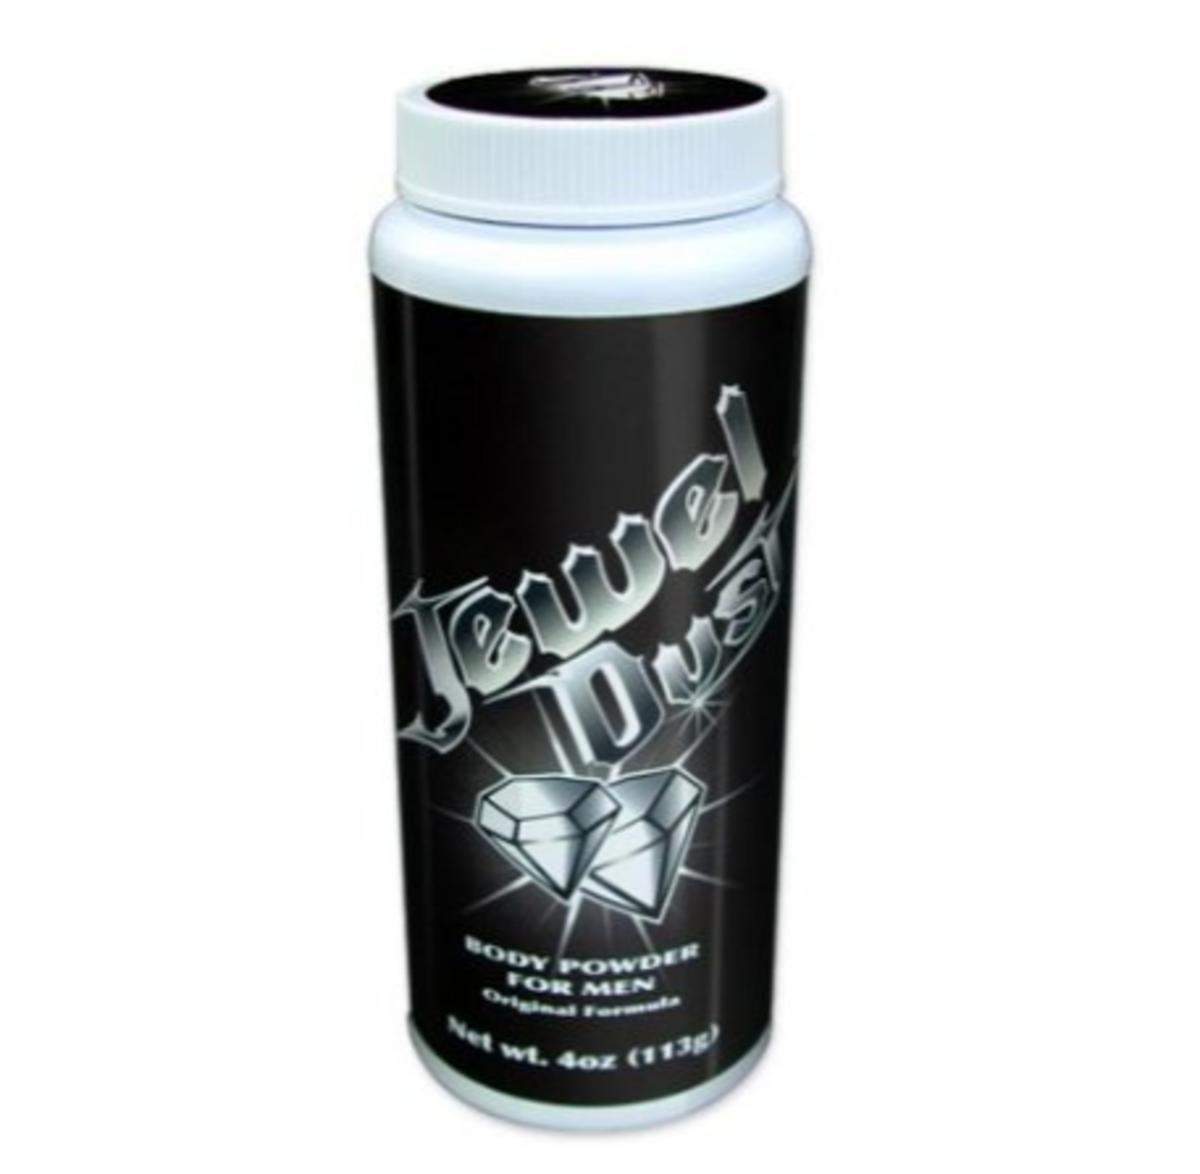 11-most-popular-body-powders-for-men